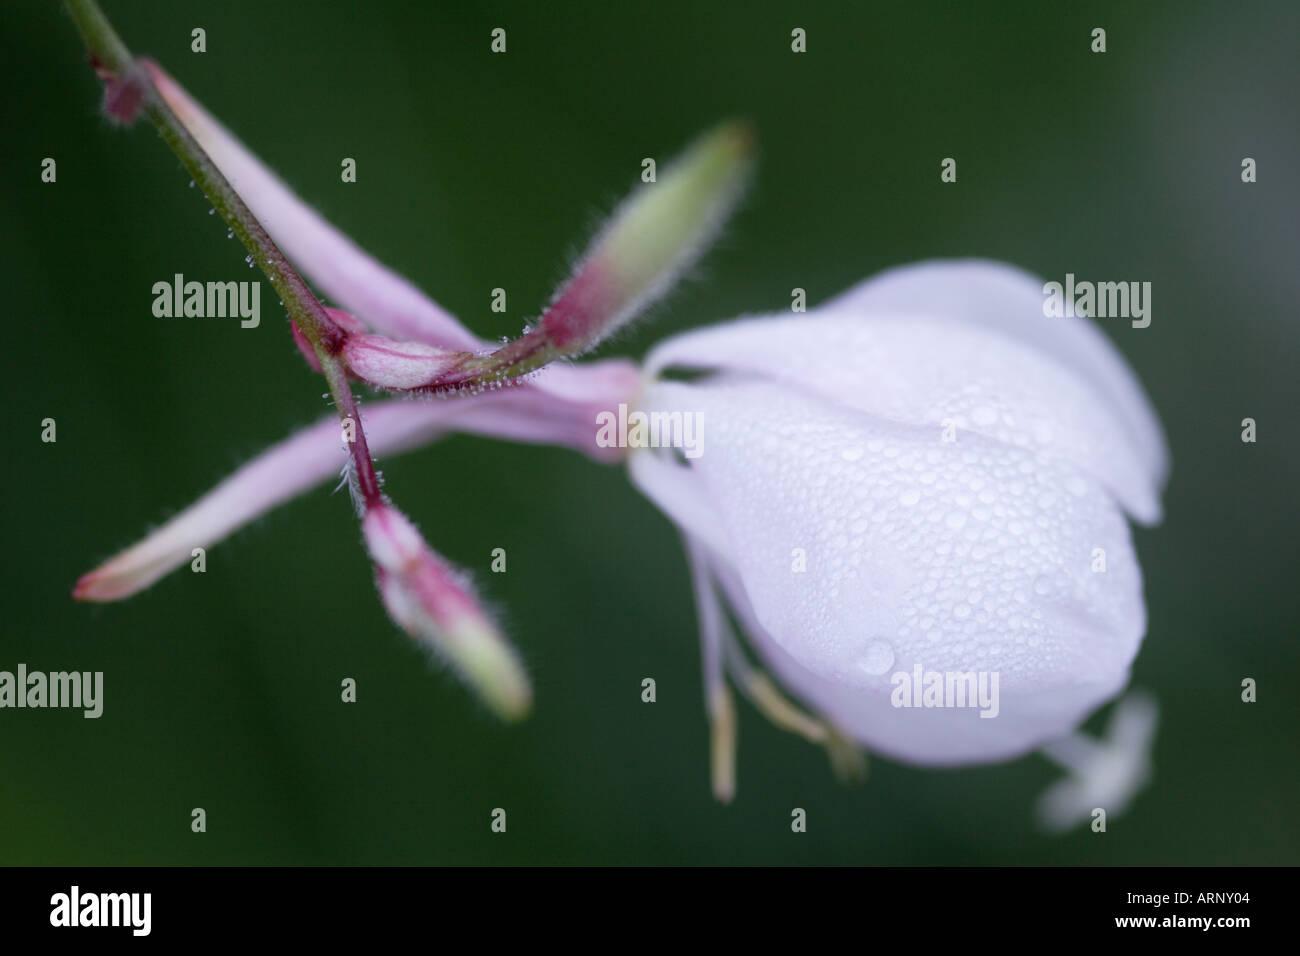 Close up of white Gaura Lindheimeri Flower bud - Stock Image